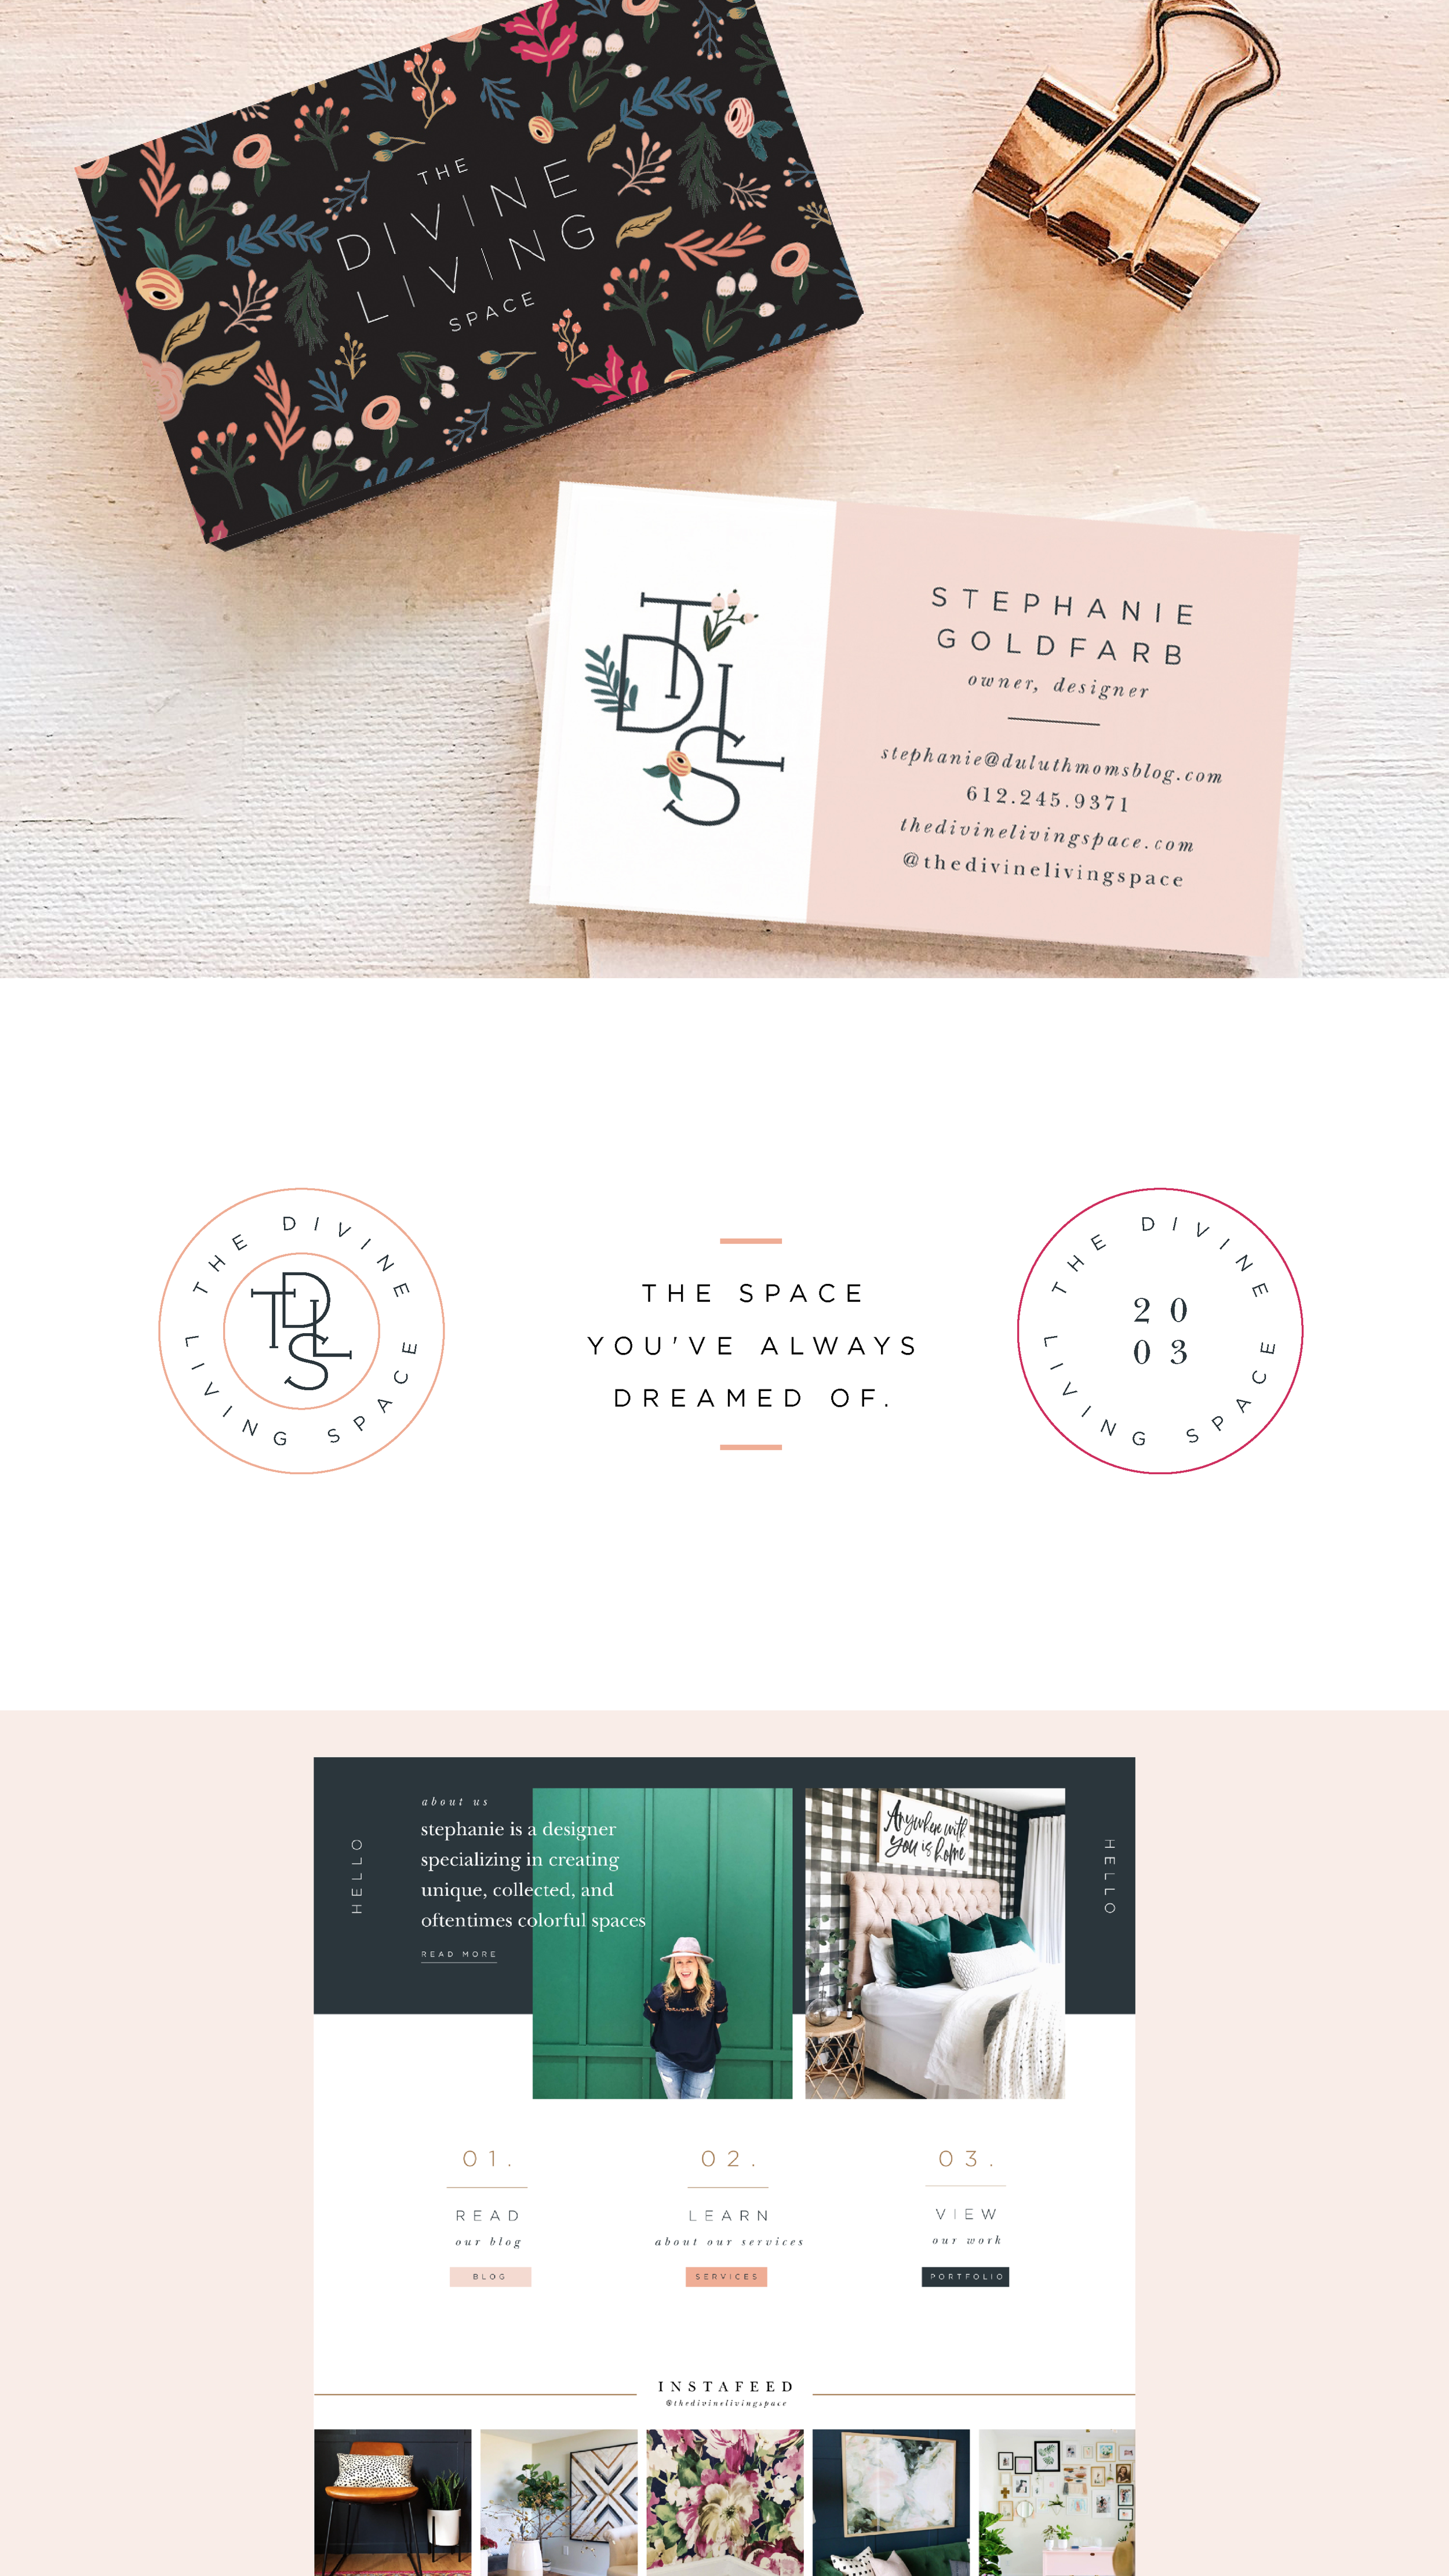 TDLS_brandingdesign_interiordesign_colorful_happy_modern_simple_clean_logo_website.jpg